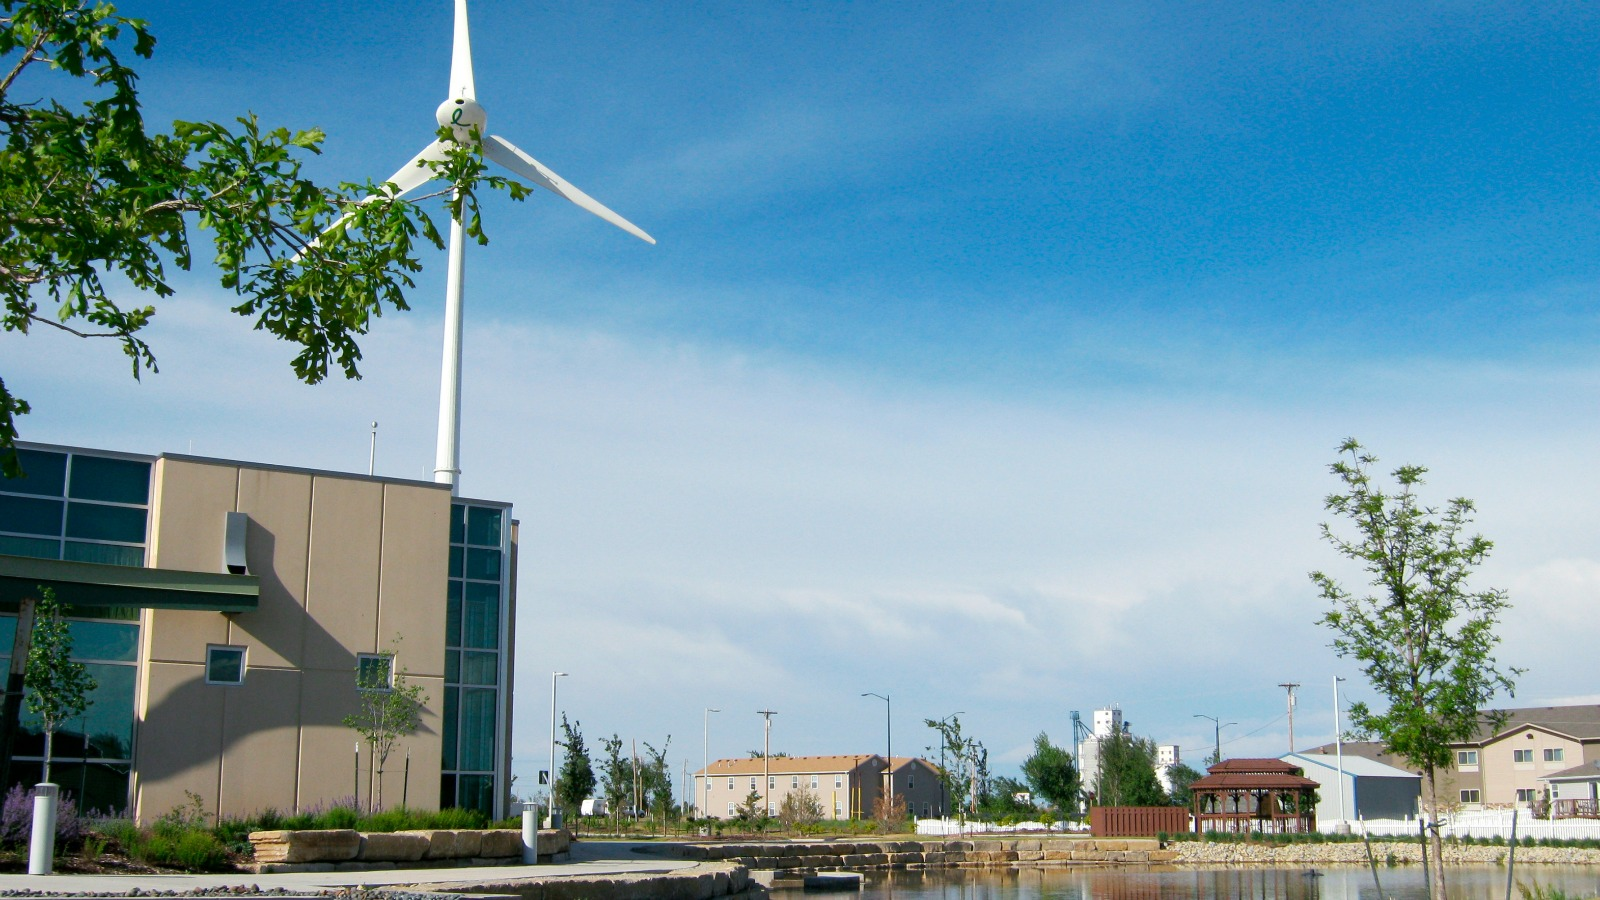 Greensburg's hospital has its own wind turbine.